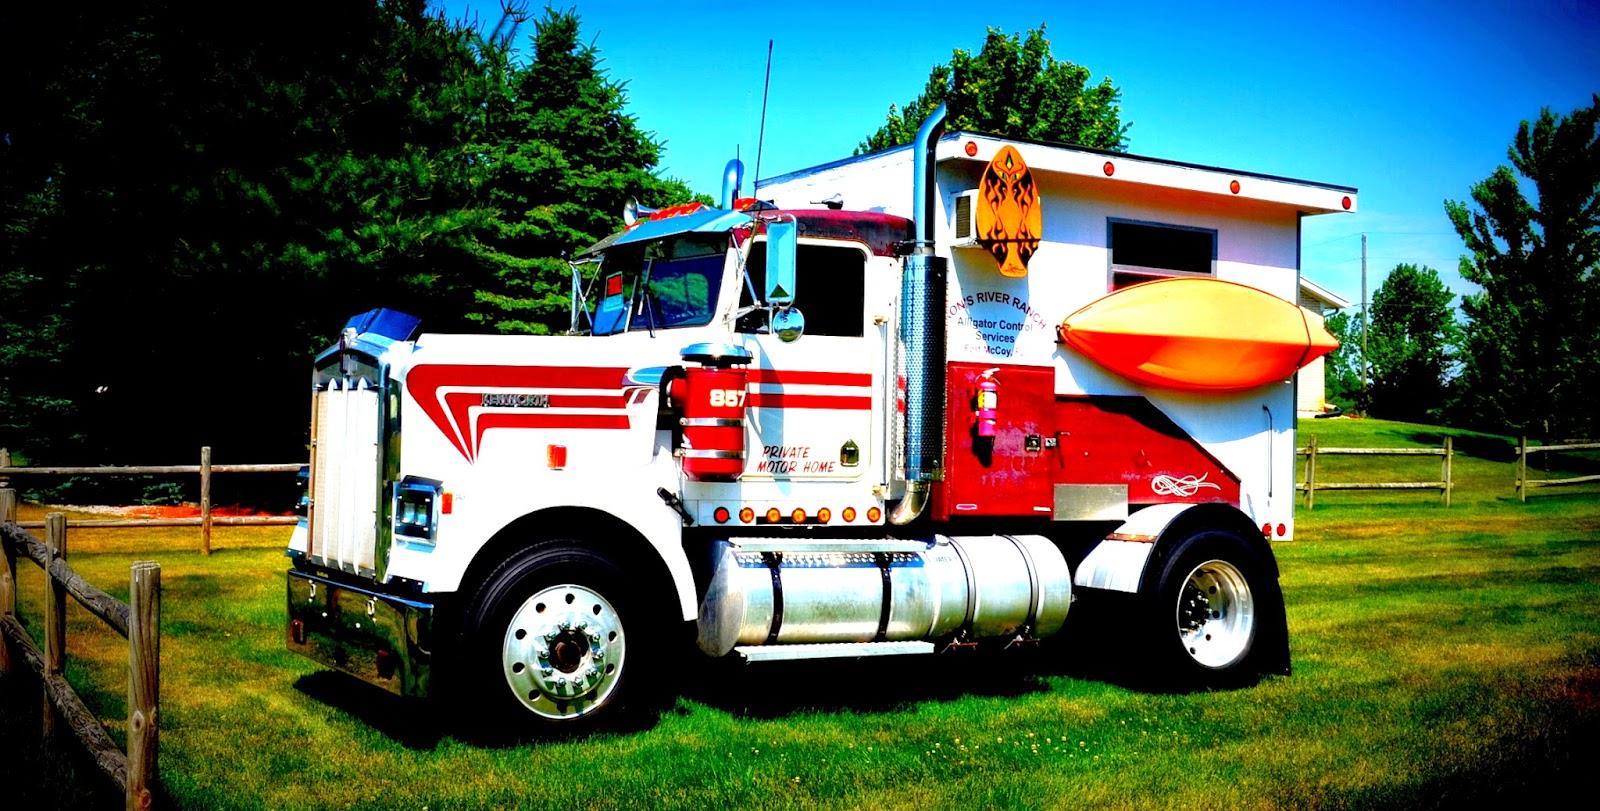 Kenworth Truck with Camper